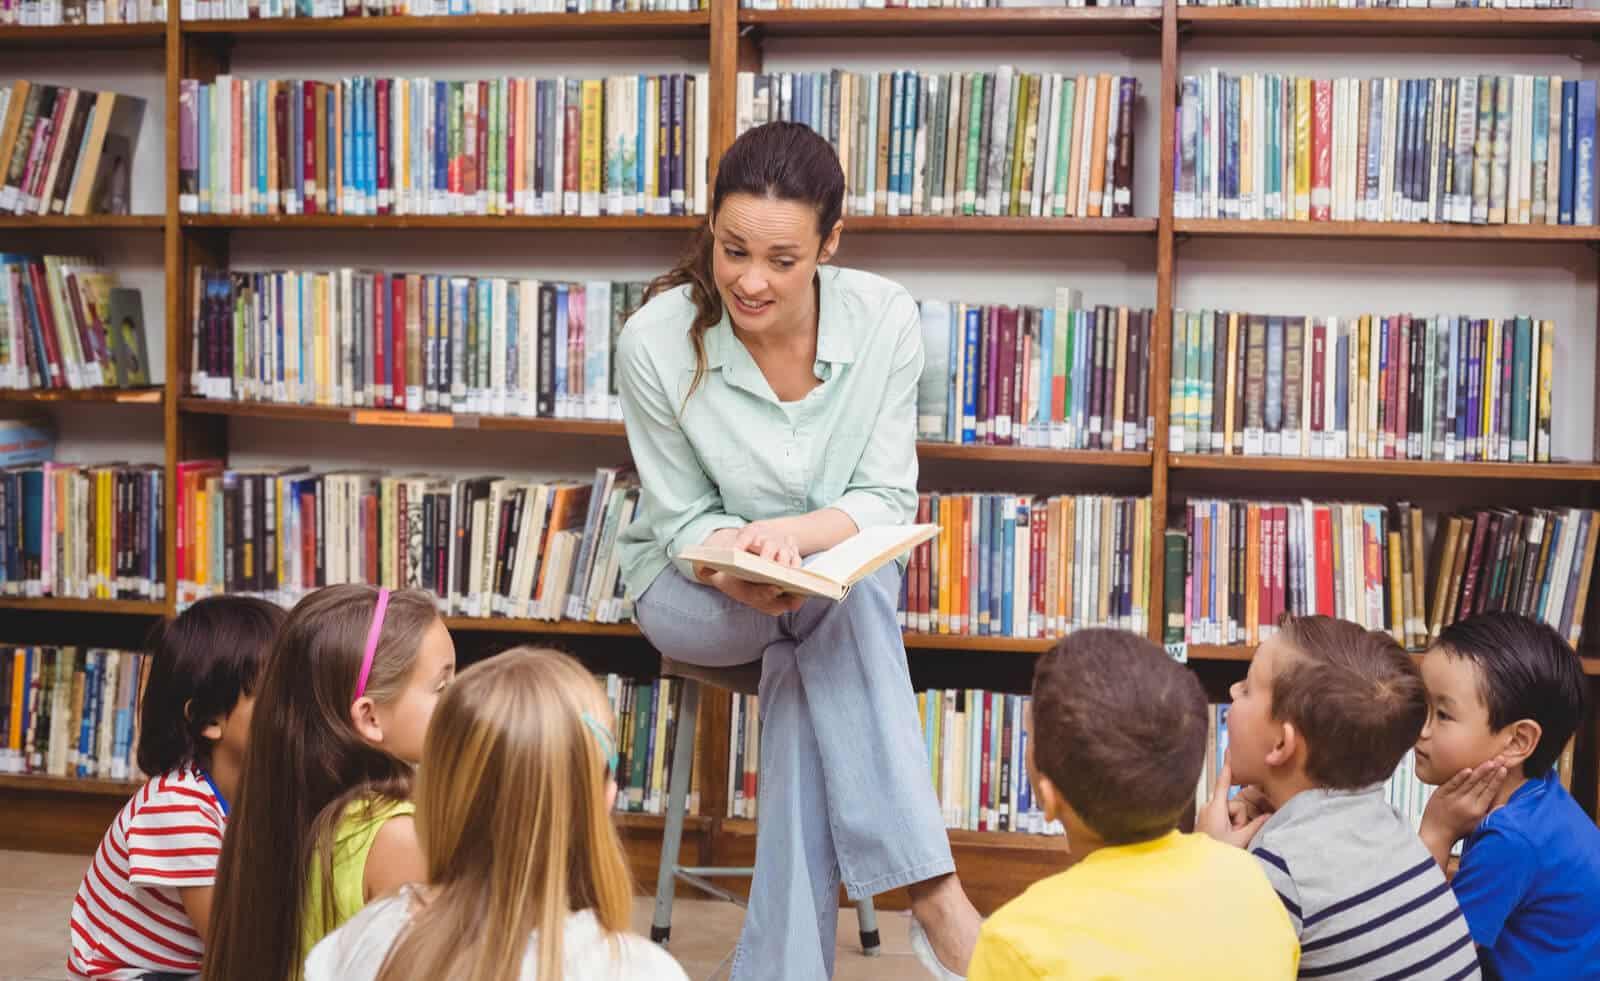 Test-Taking Strategies for FTCE Reading K-12 Exam header